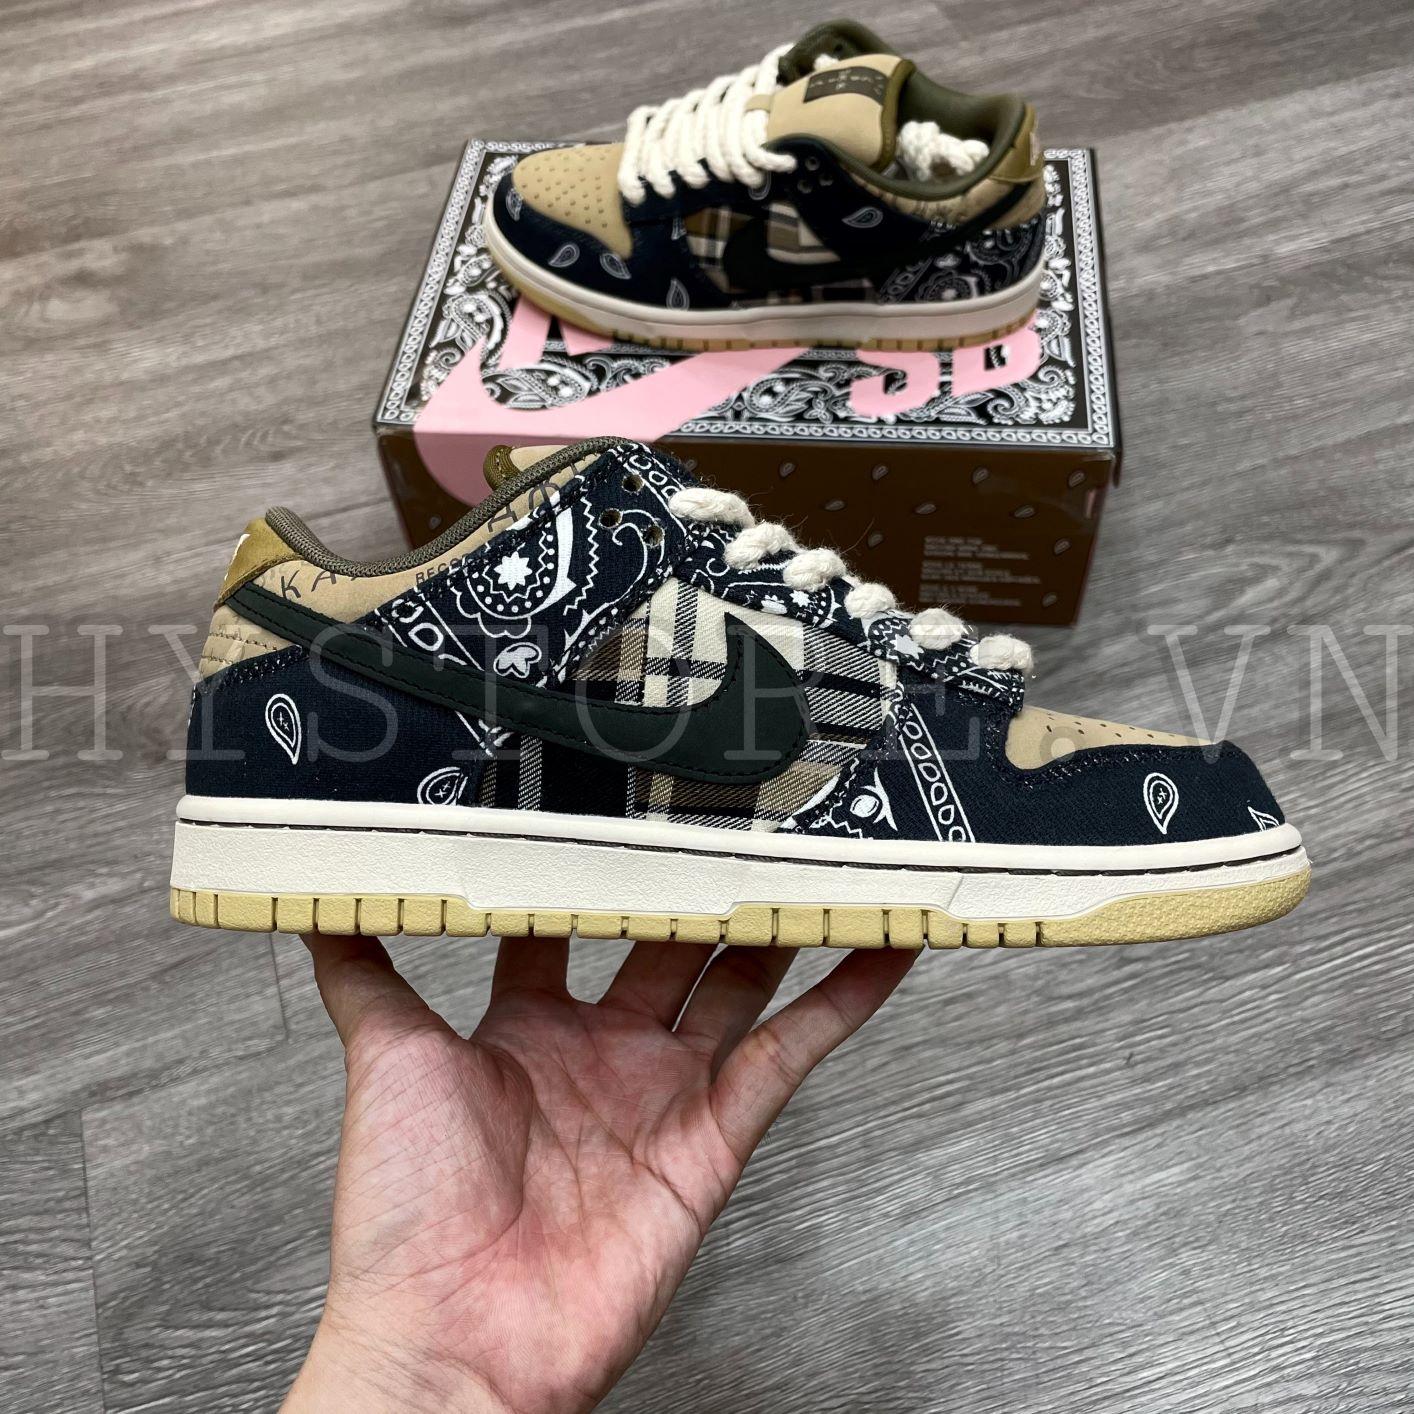 Giày Nike Sb Dunk Travis Scott